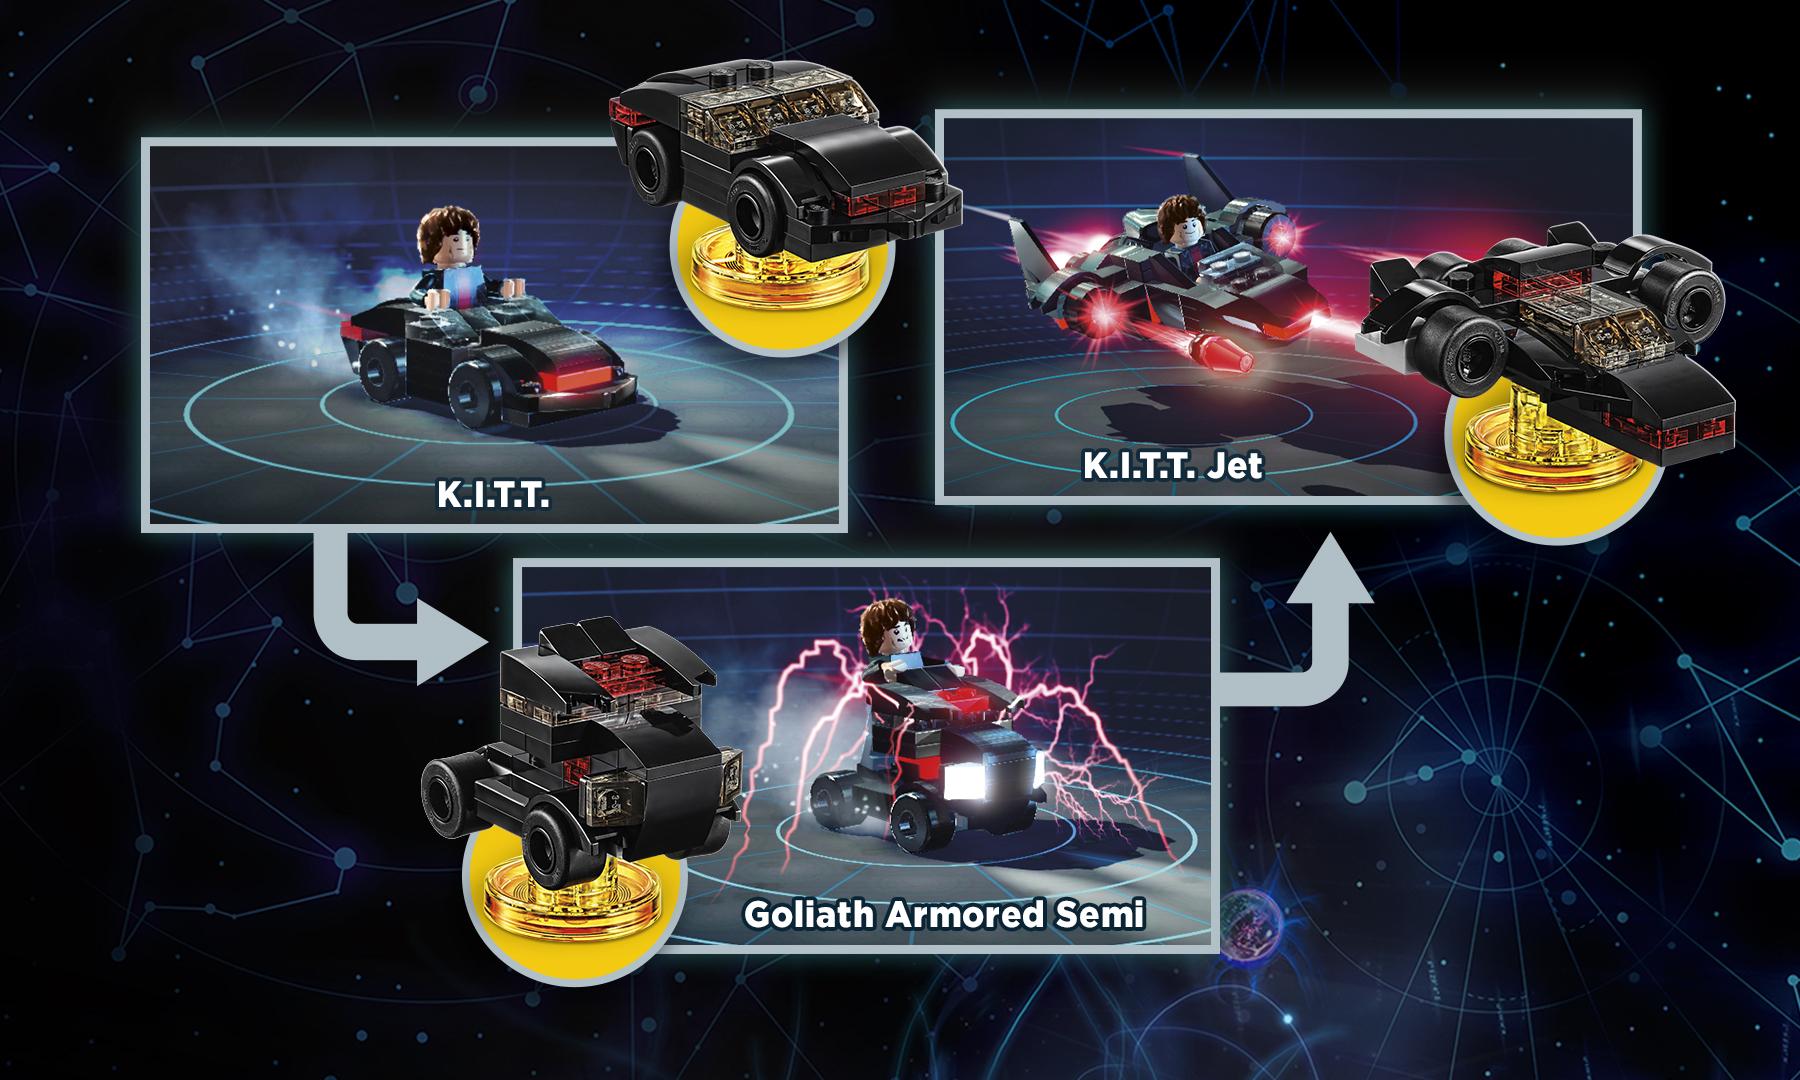 LEGO Dimensions Knight Rider Fun Pack - Rebuilds